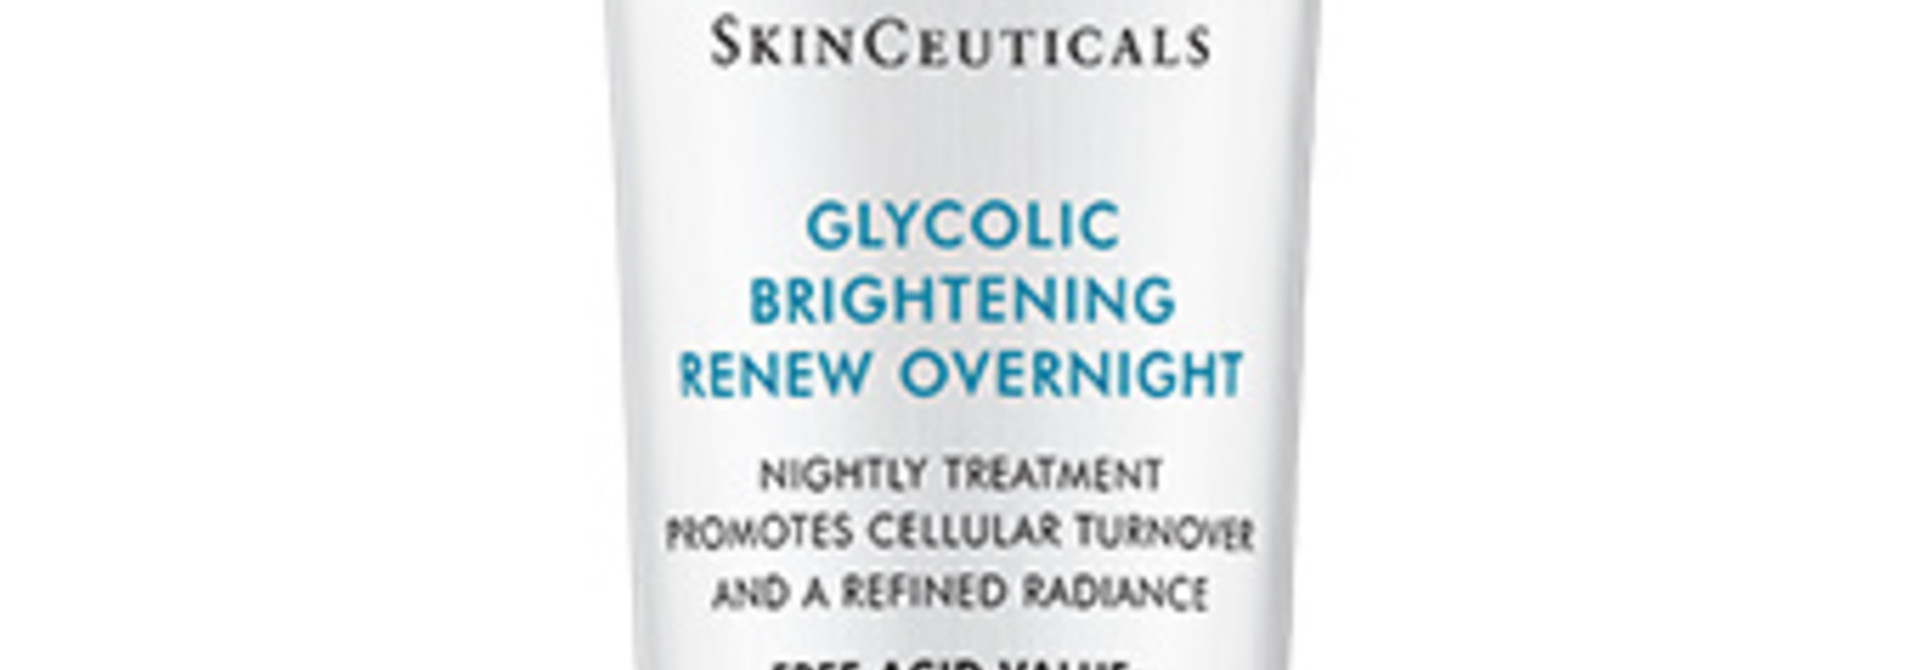 Glycolic Brightening Renew Overnight